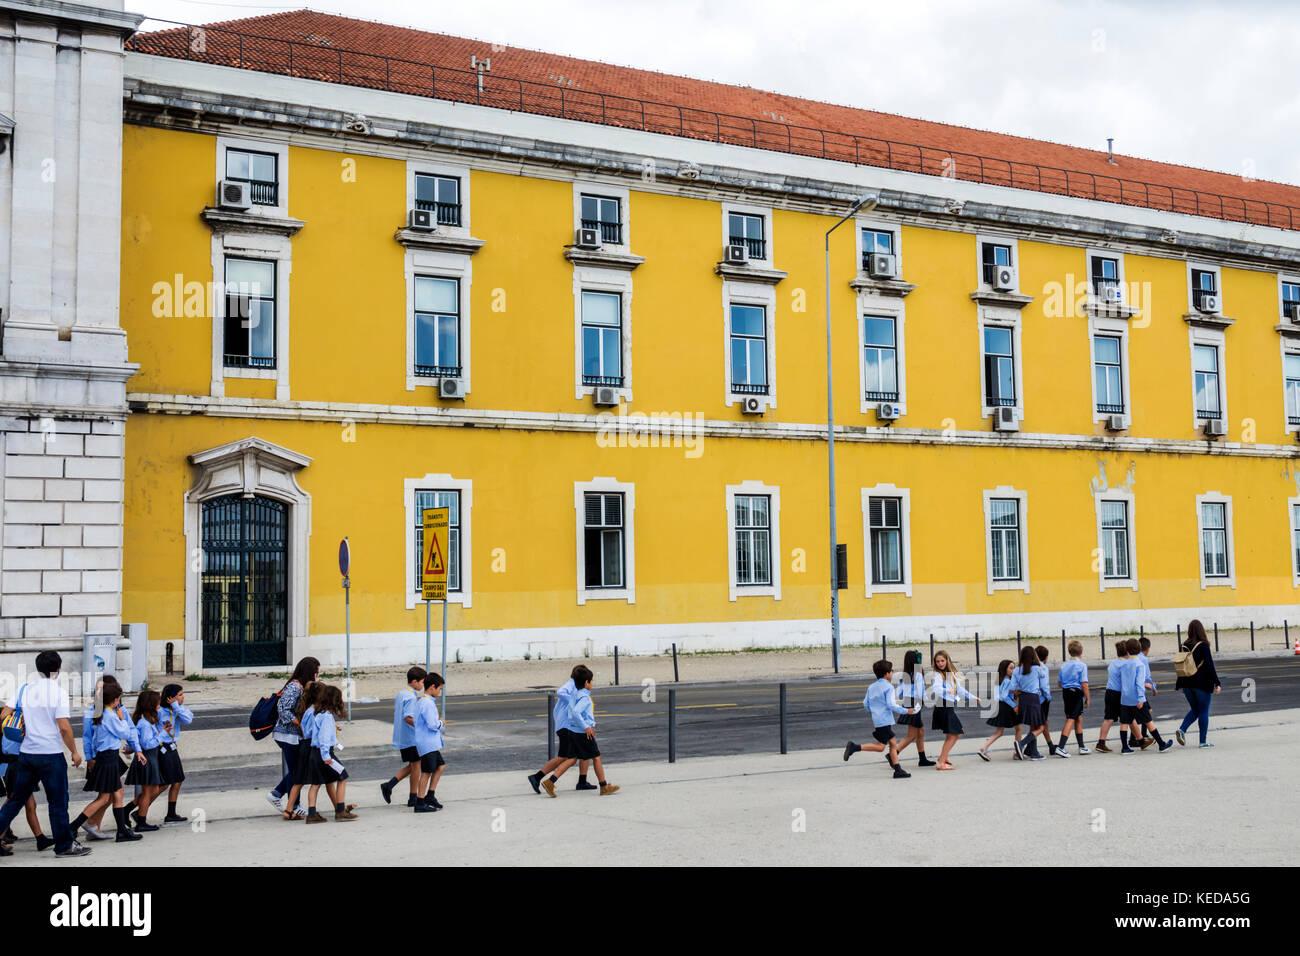 Lisbon Portugal Baixa Pombalina Terreiro do Paco Praca do Comercio Commerce Square plaza school children uniform - Stock Image